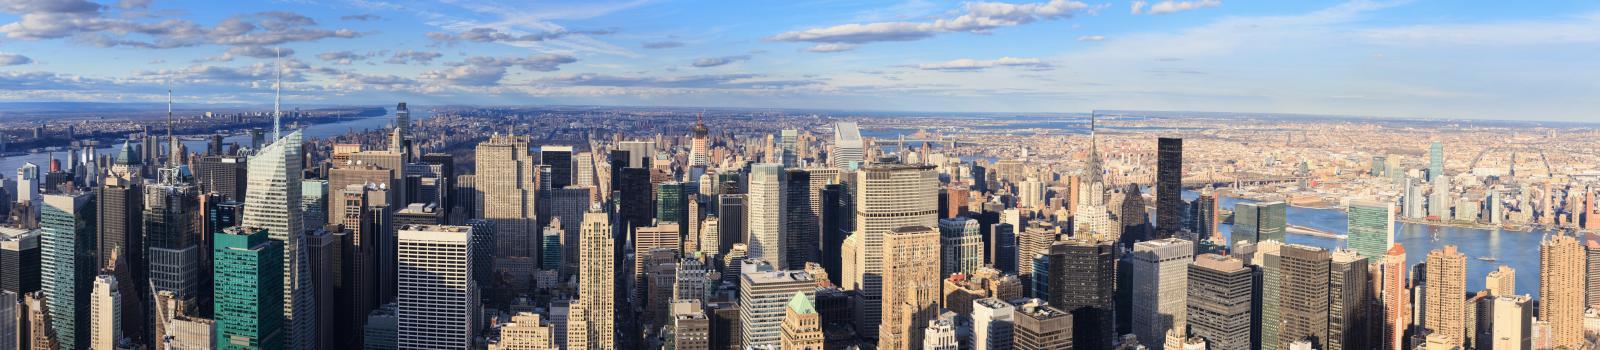 NYC Skyline - Pass Comparison